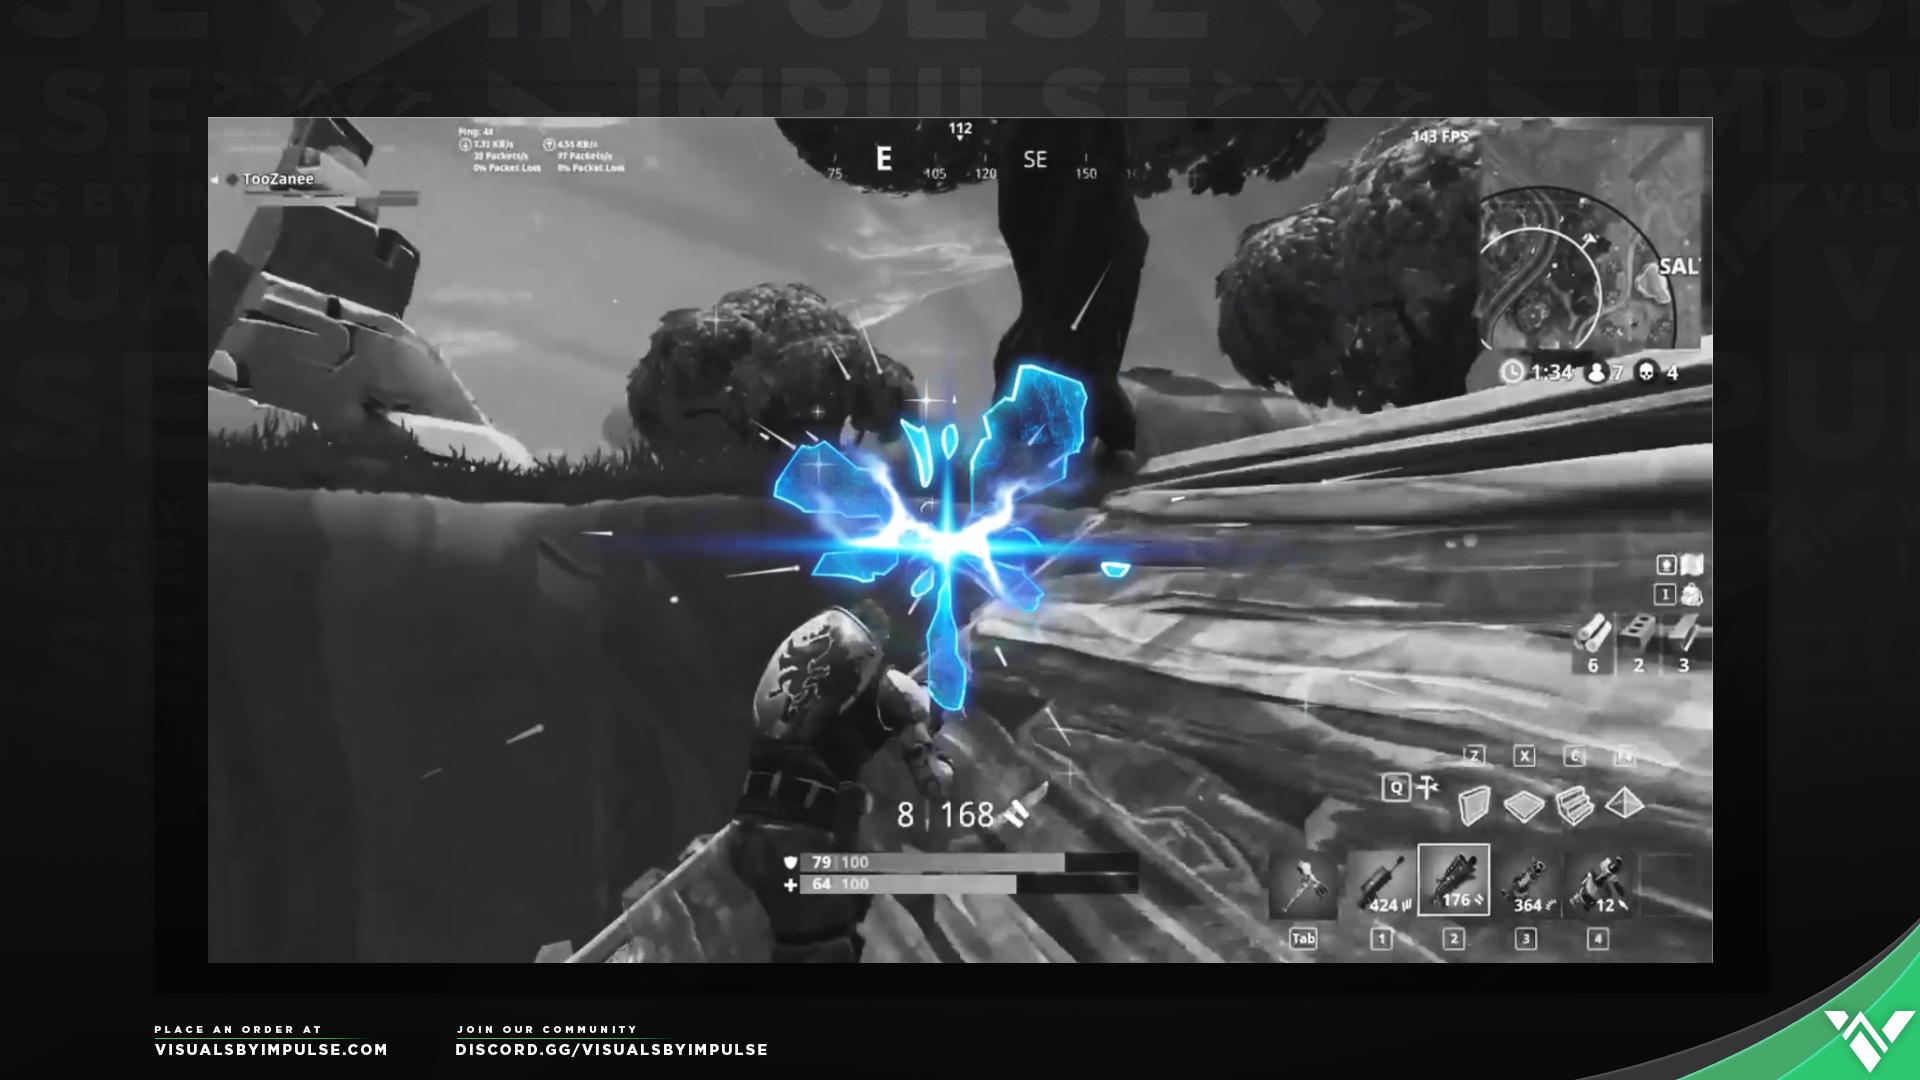 Fortnite Rift Stream Transition - Visuals by Impulse